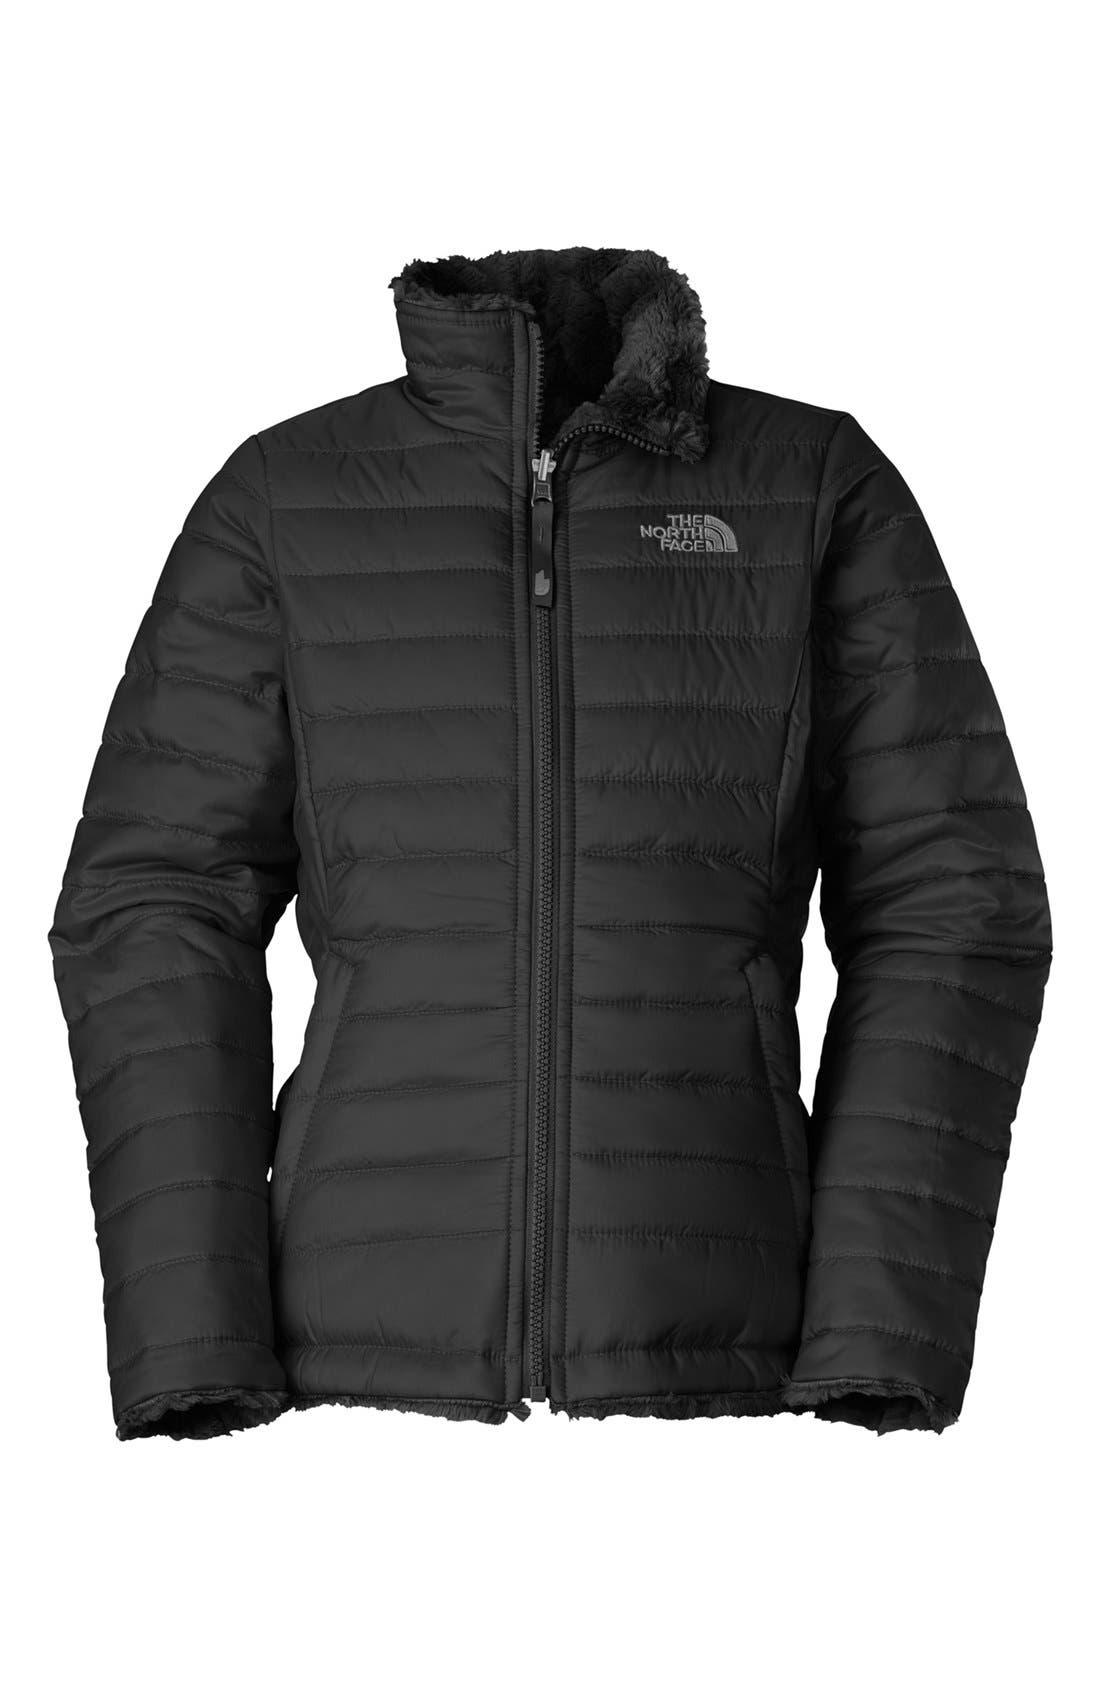 Main Image - The North Face 'Mossbud Swirl' Reversible Jacket (Little Girls & Big Girls)